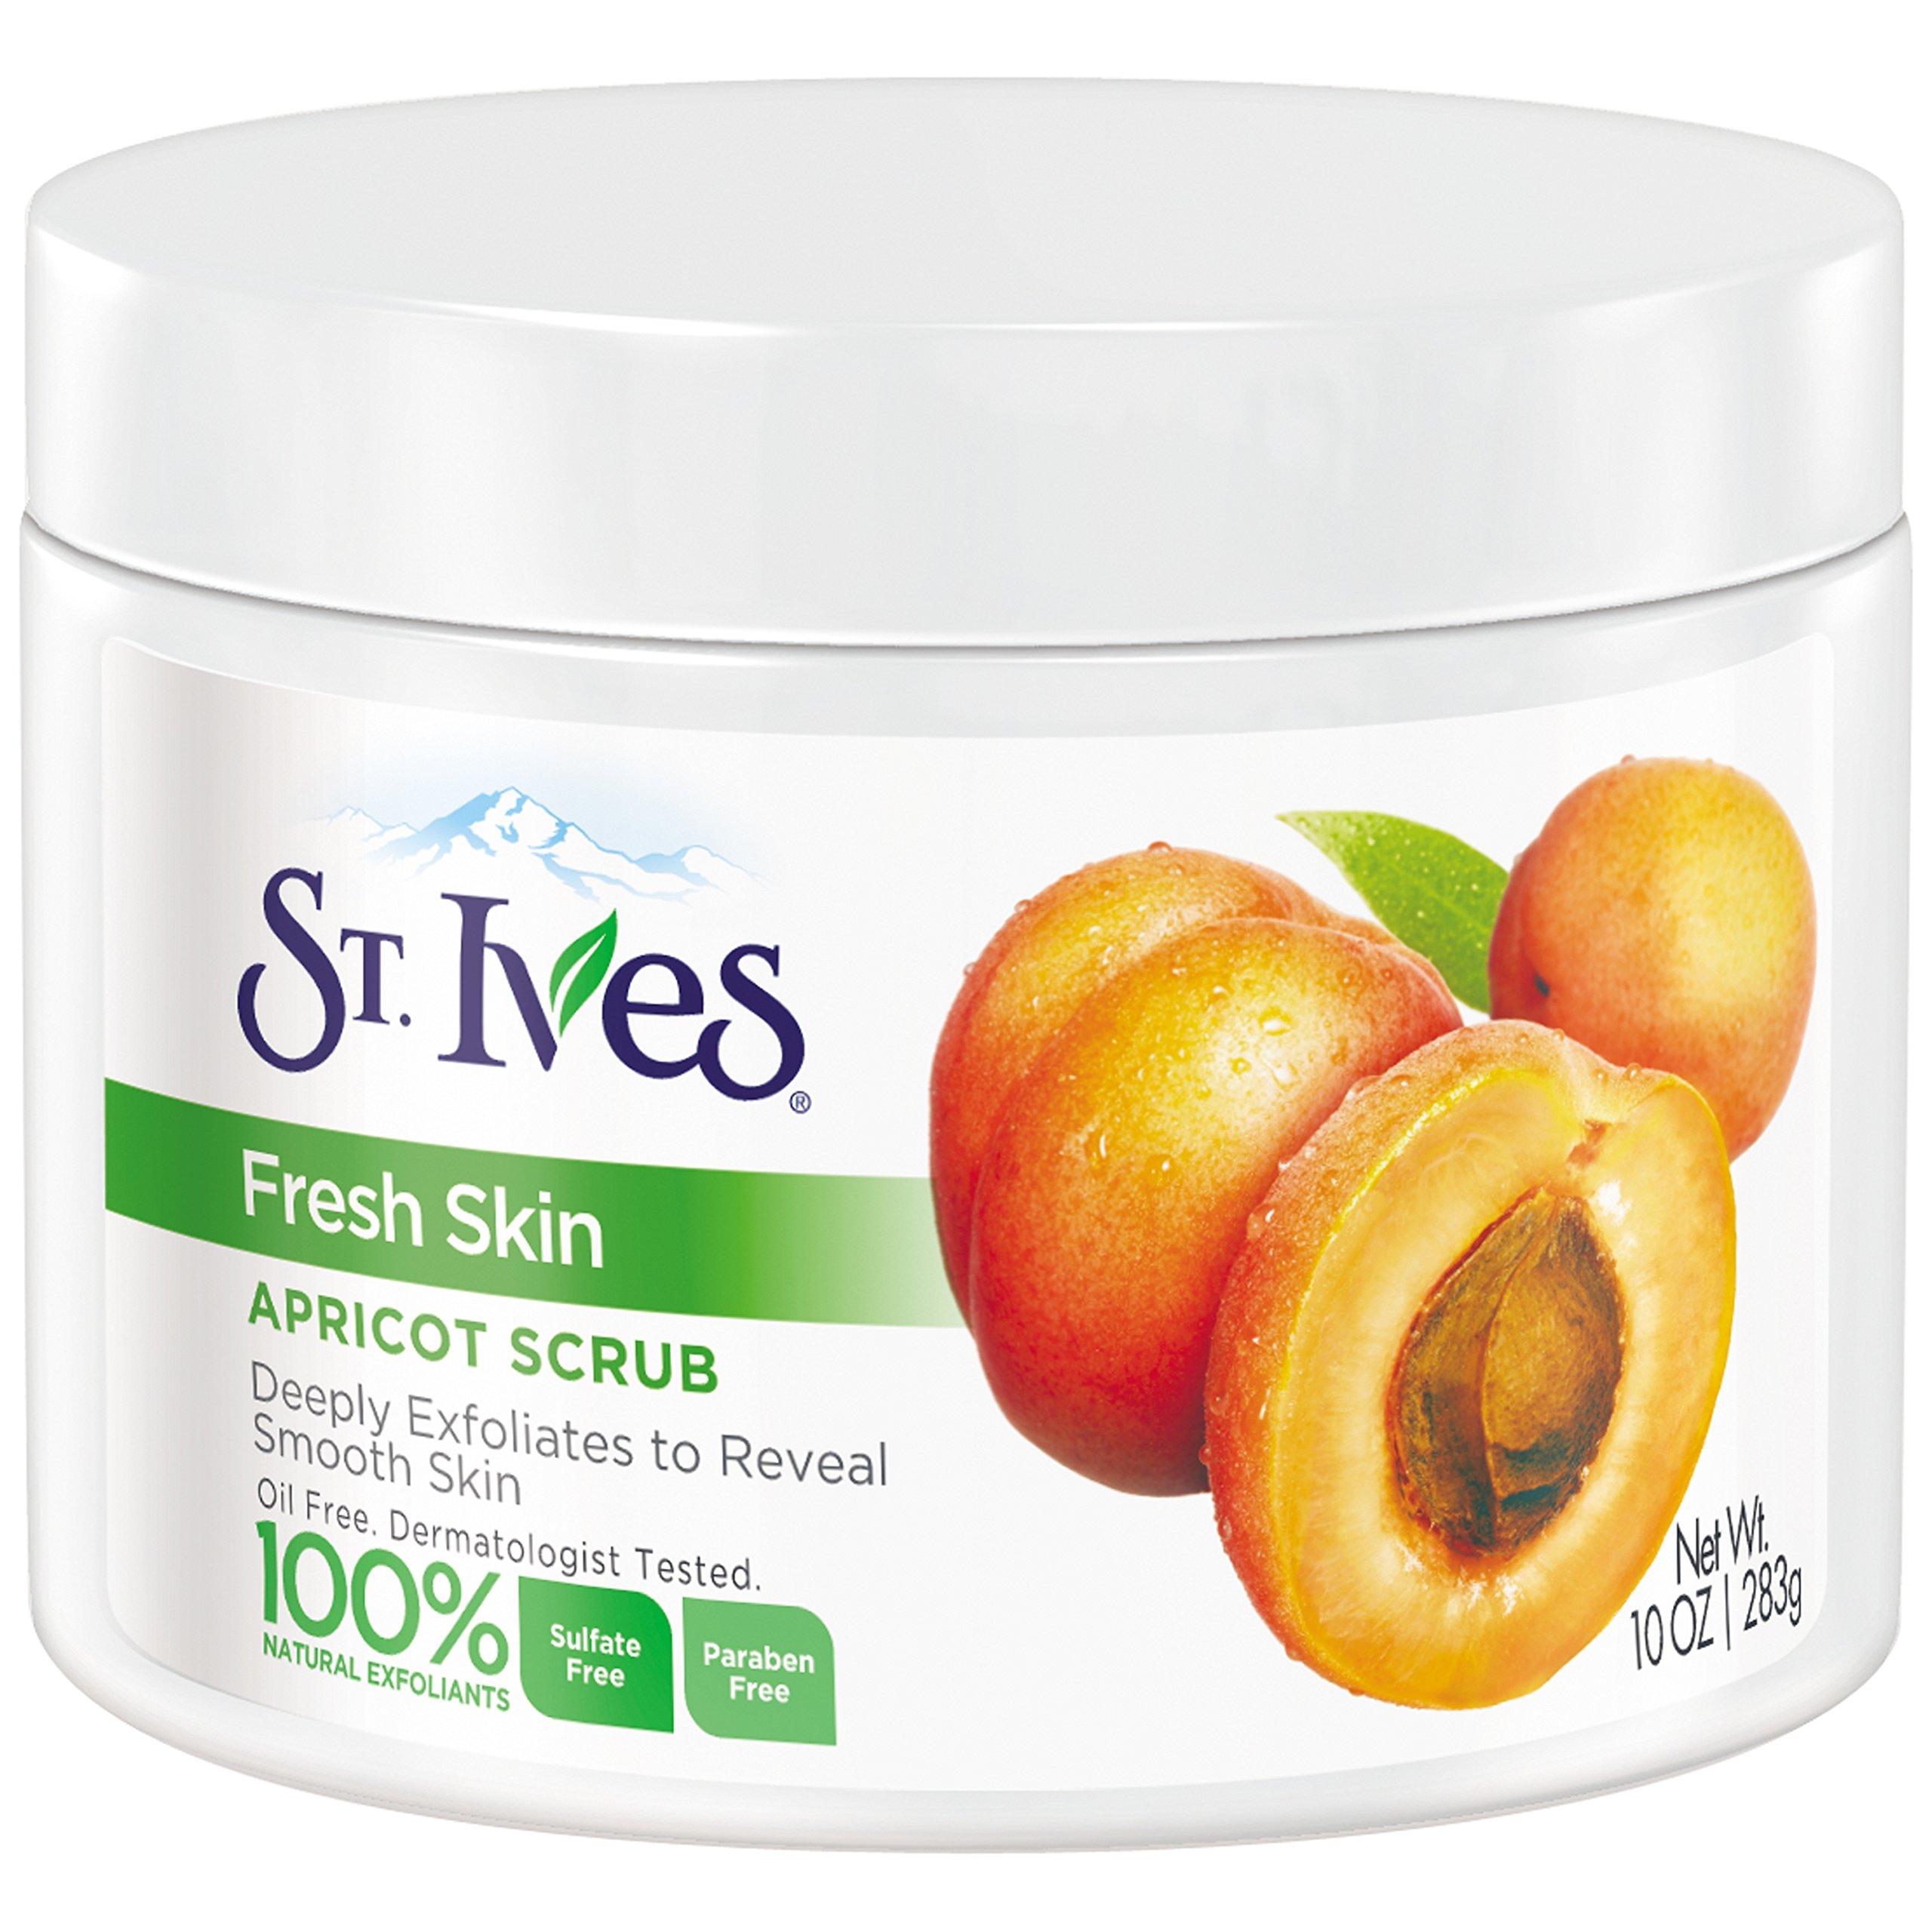 St. Ives Fresh Skin Face Scrub, Apricot 10 oz